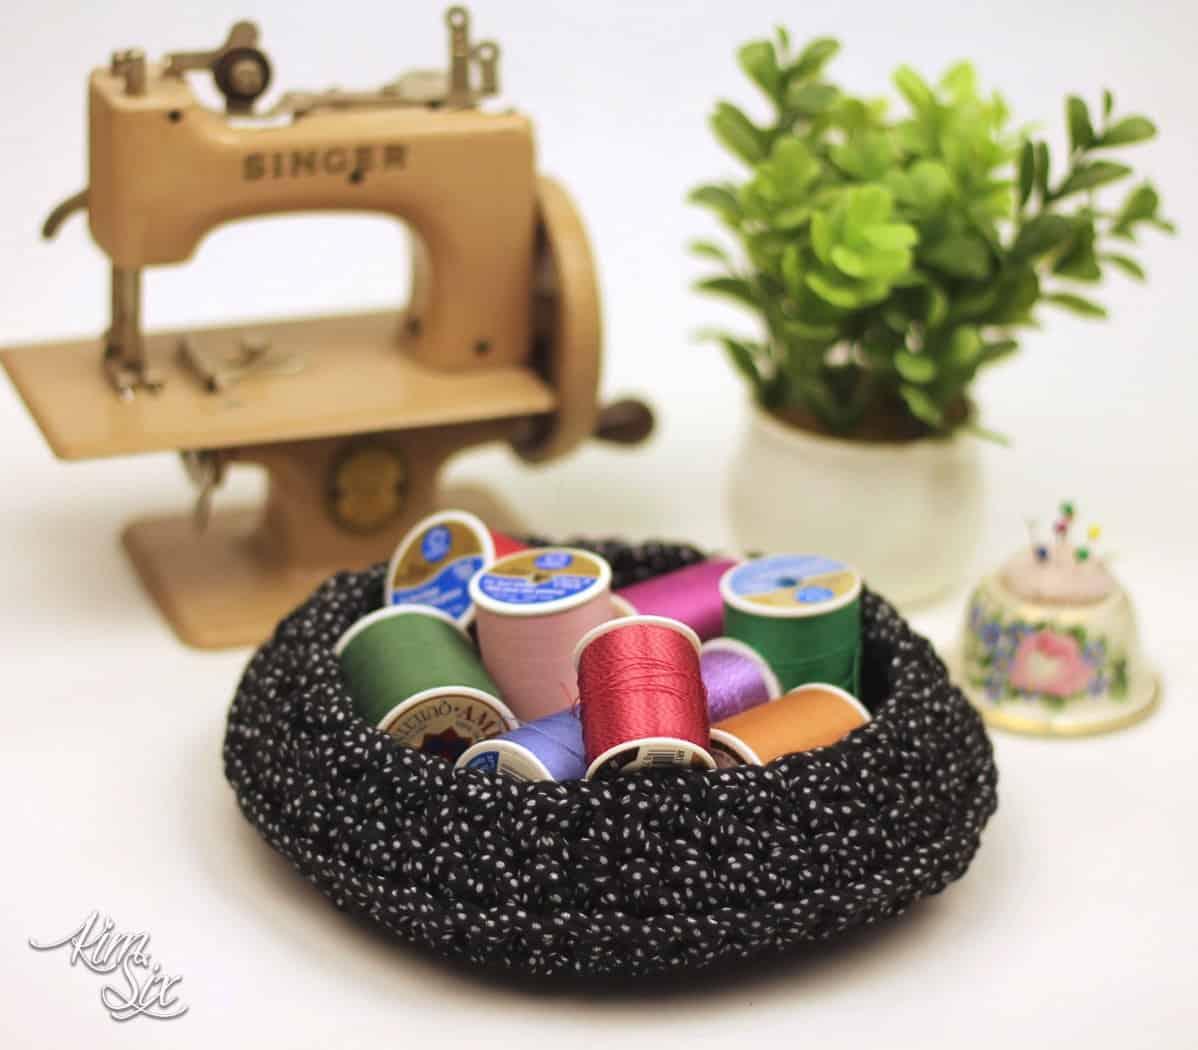 crocheting with t-shirt yarn